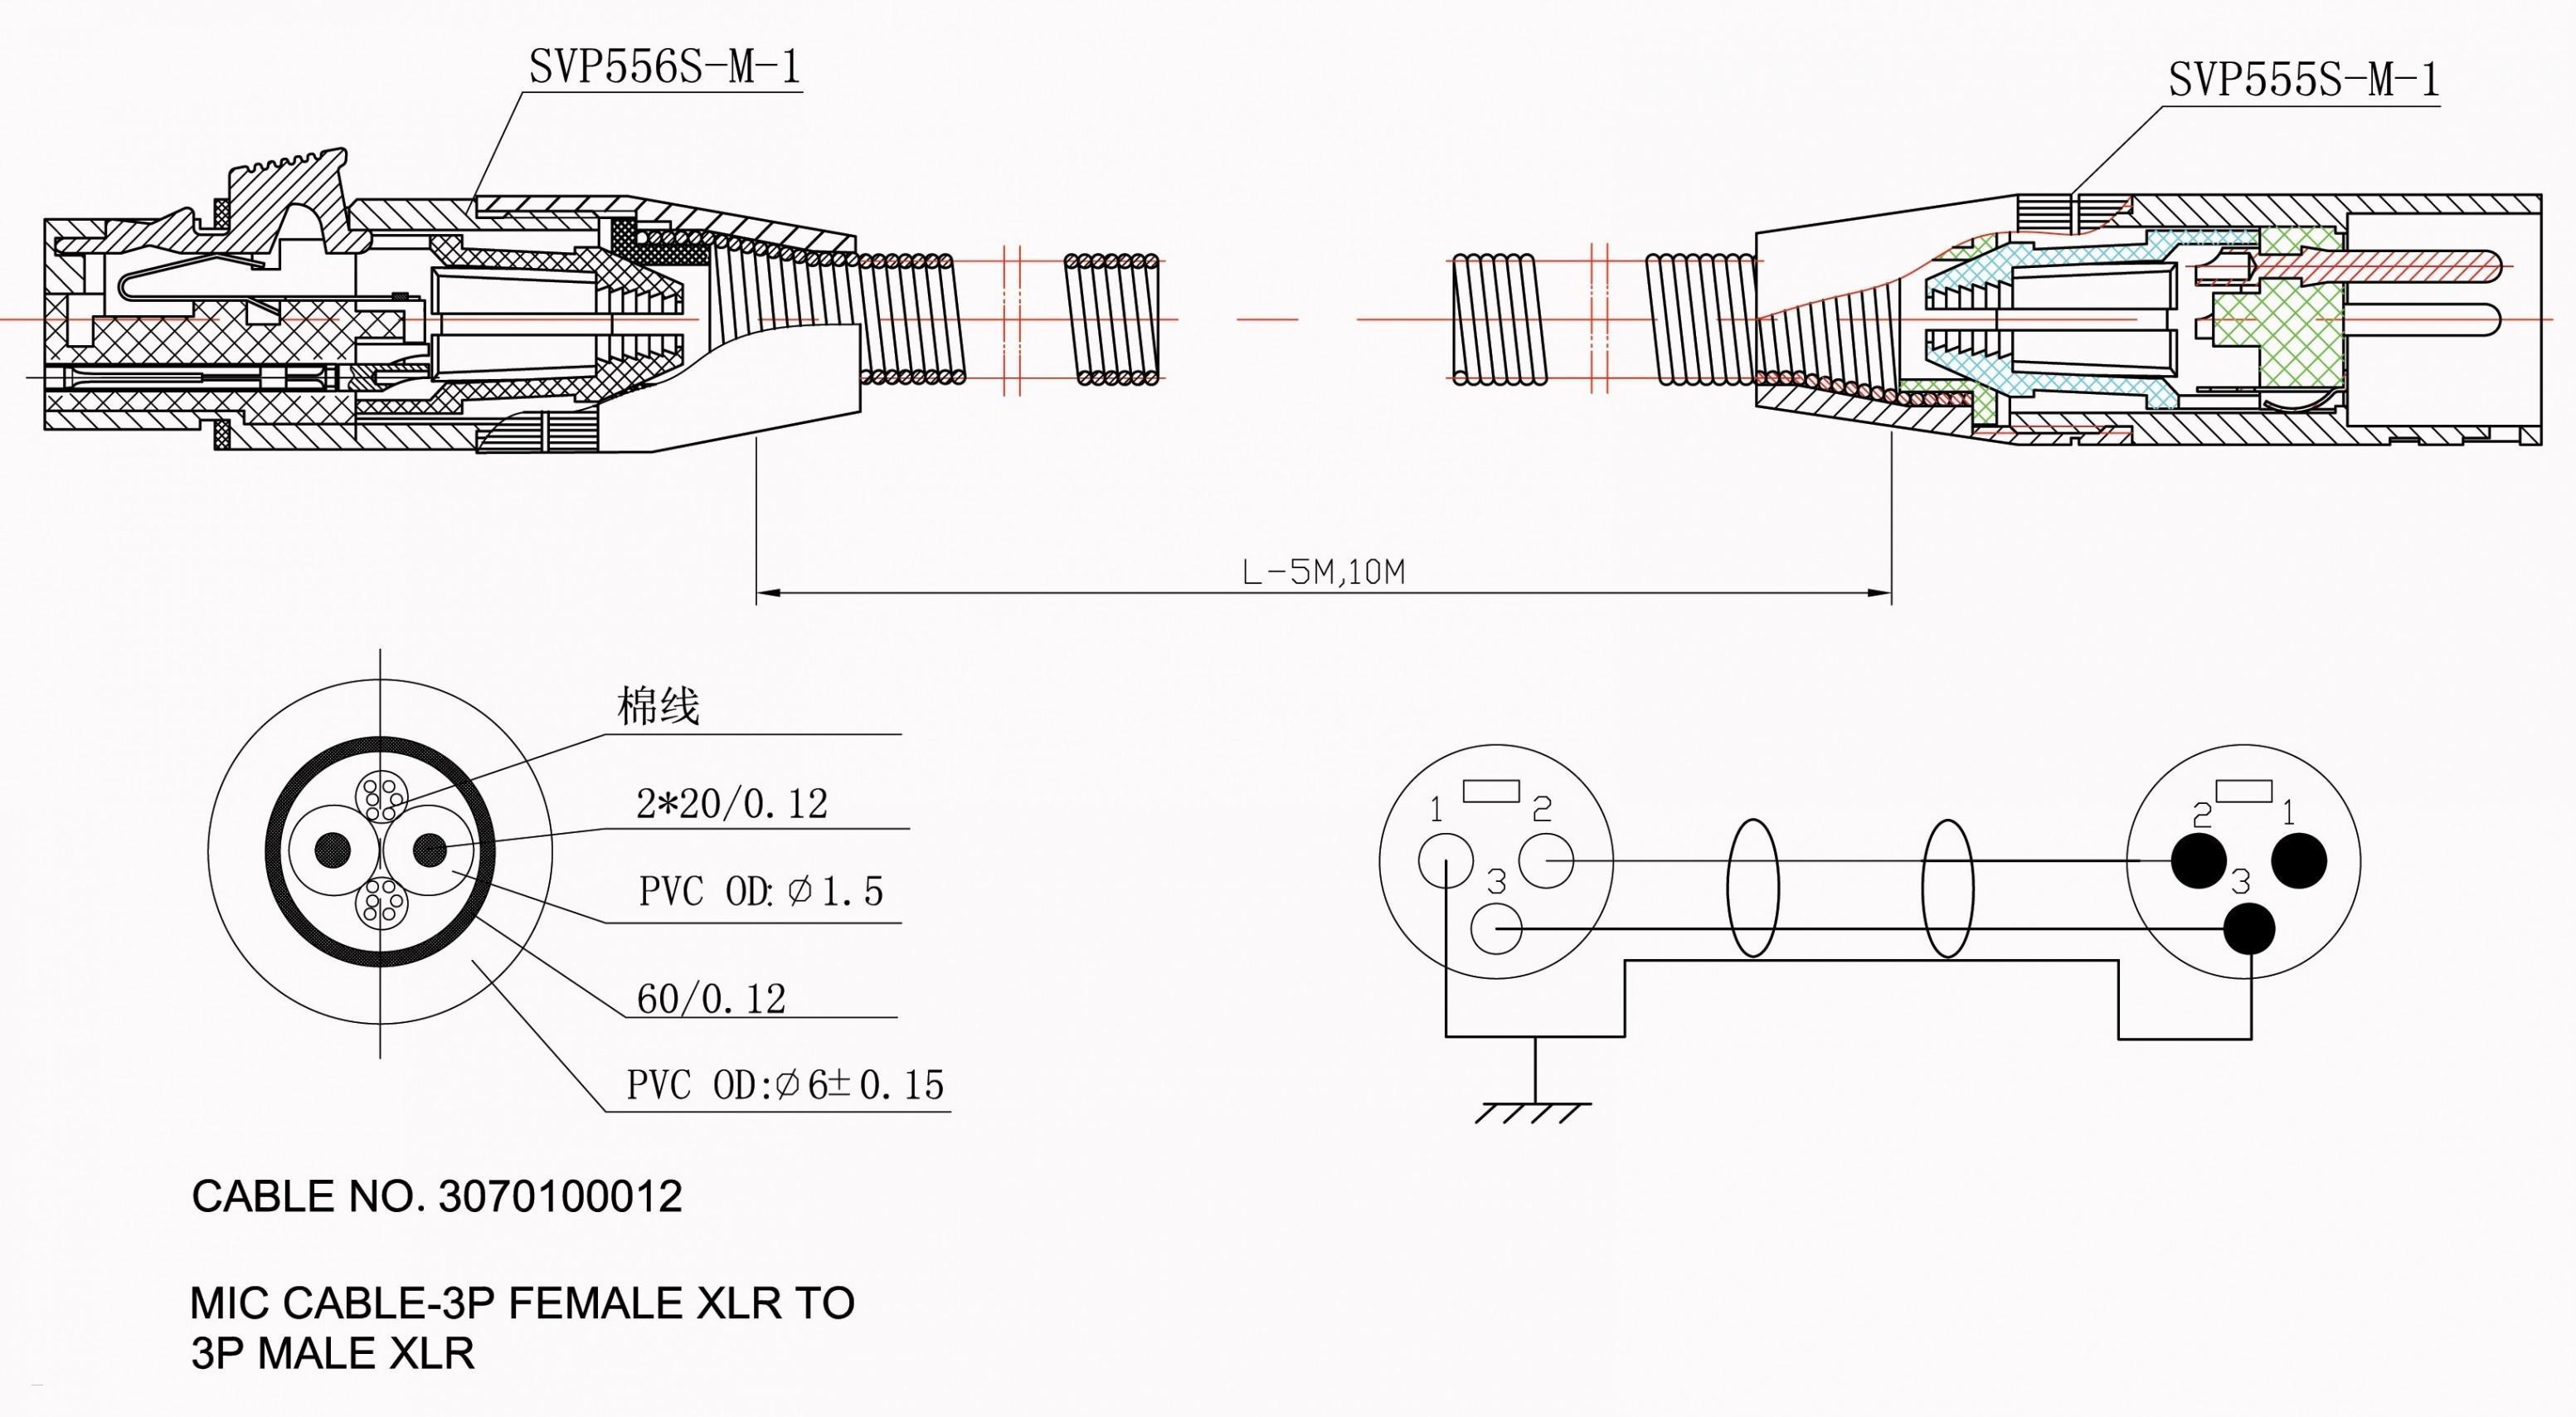 1997 Geo Metro Engine Diagram 1995 2000 M08 Wiring Harness ...  Geo Metro Engine Diagram on